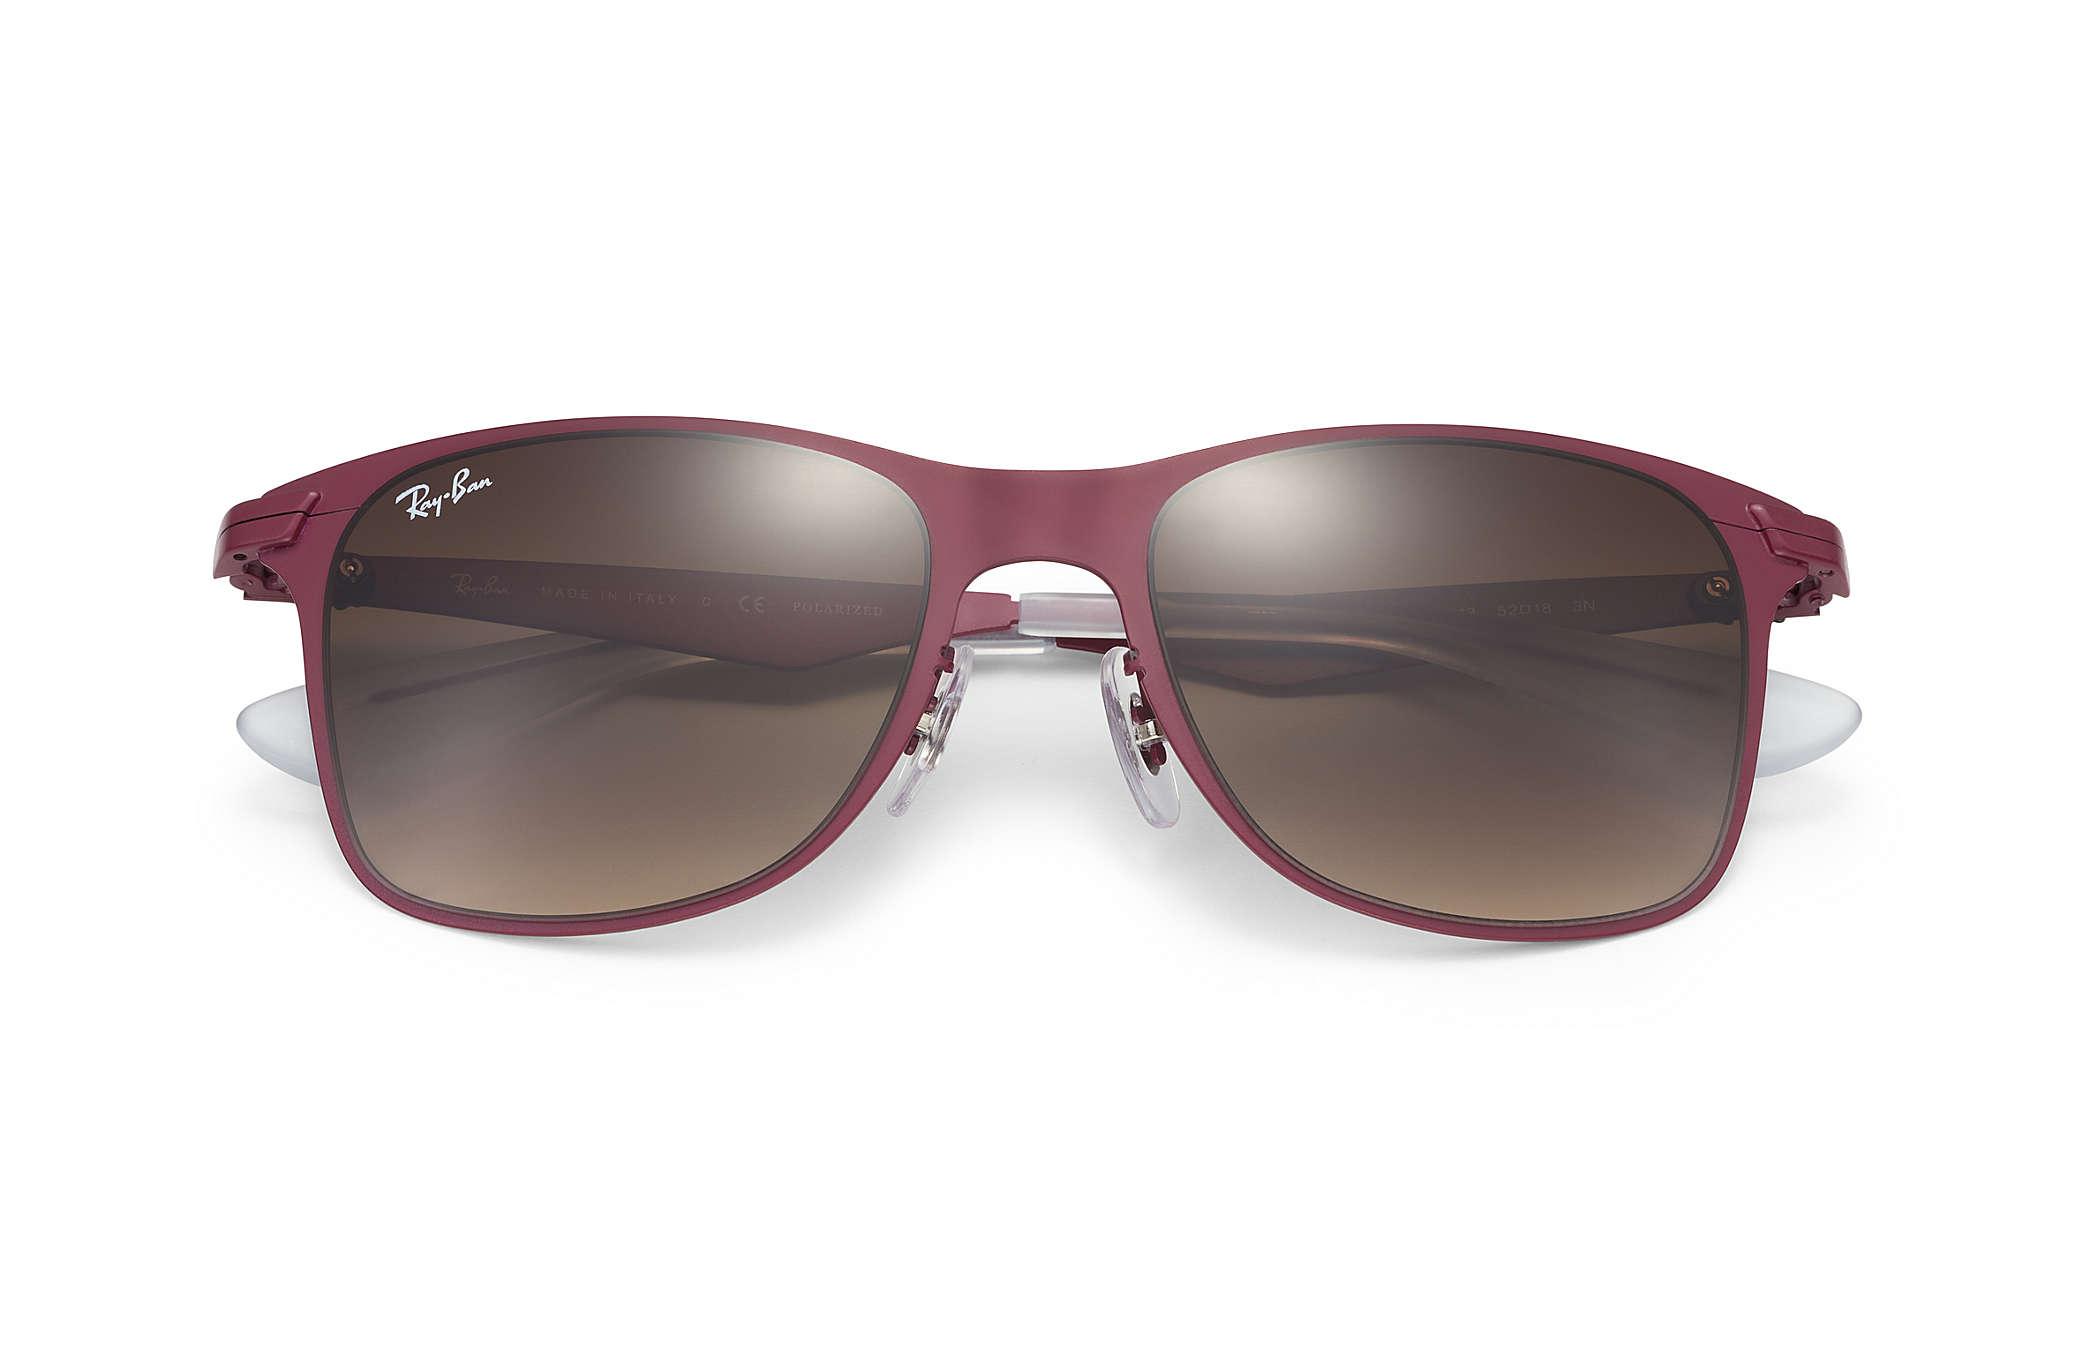 metal wayfarer sunglasses  Ray-Ban Wayfarer Flat Metal Red, RB3521